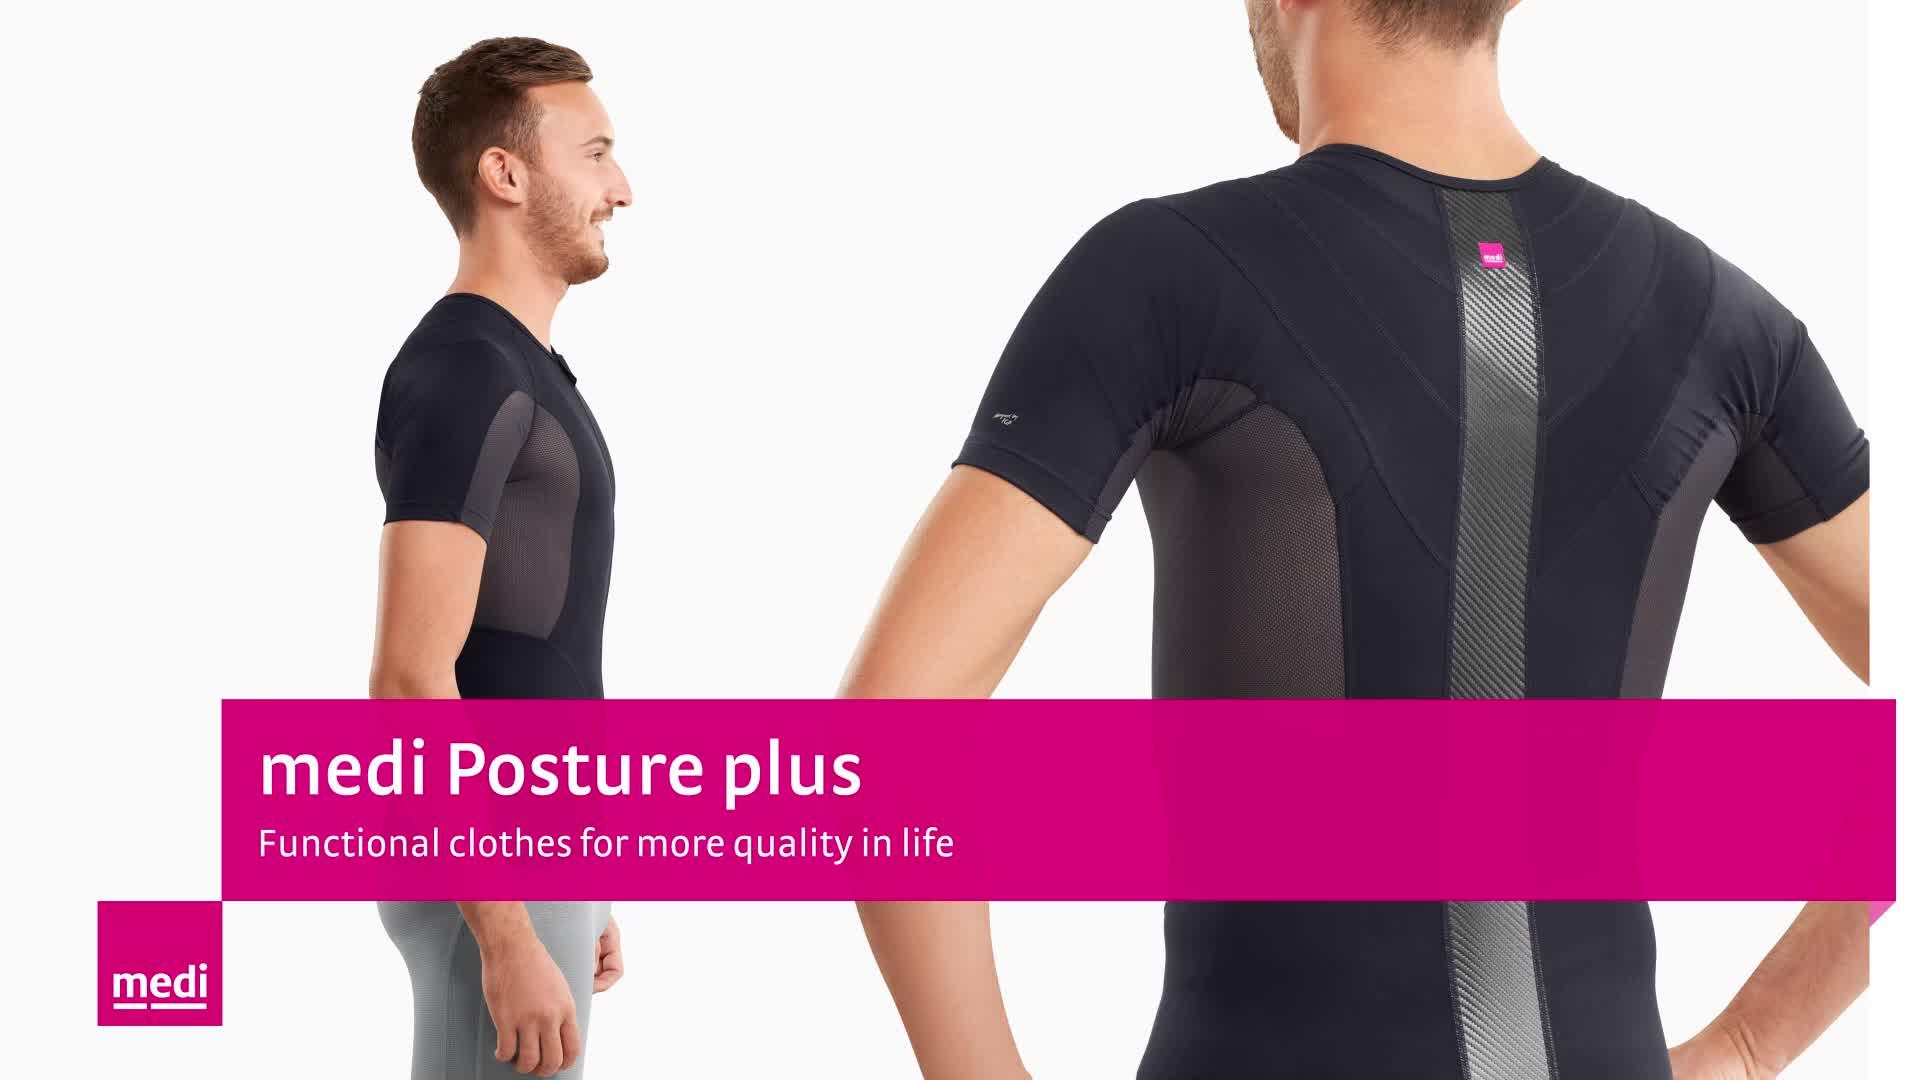 Medi Posture plus: TIENDA ONLINE de Ortopedia La Fama }}